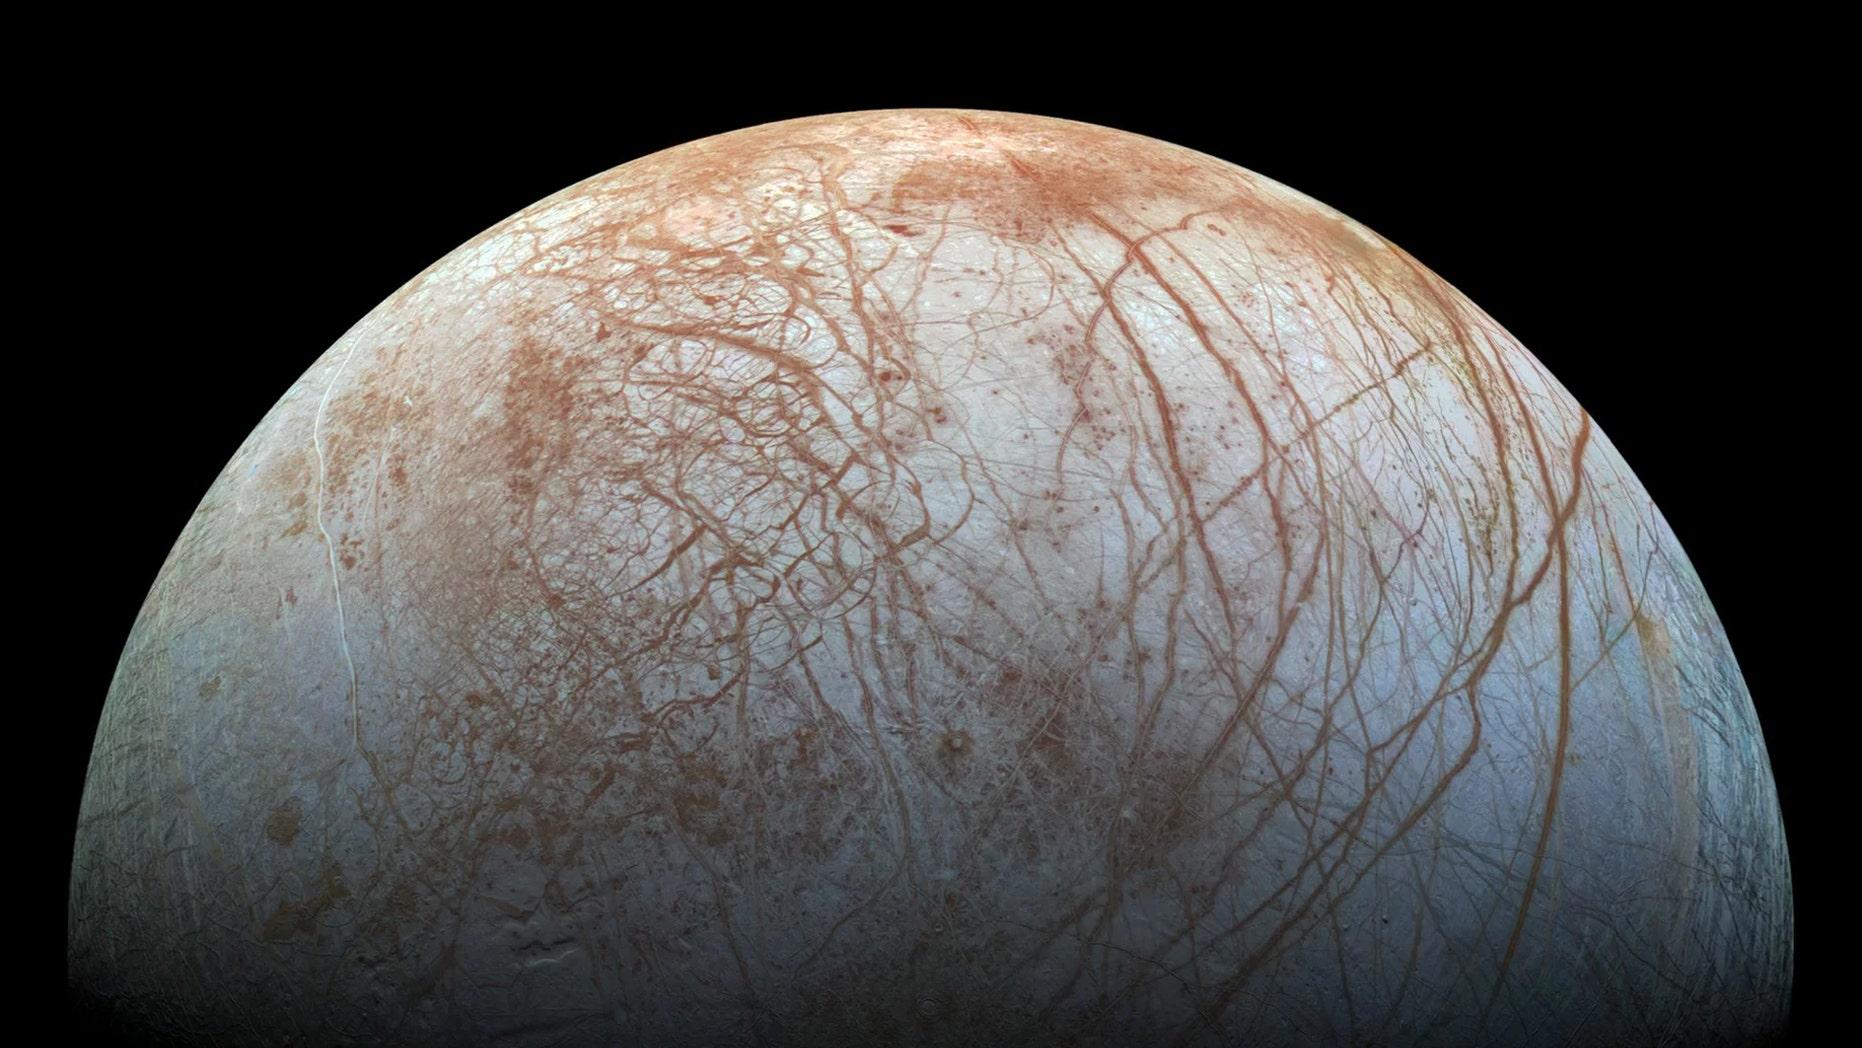 Jupiter's moon Europa, as photographed by NASA's Galileo spacecraft. Credit: NASA/JPL-Caltech/SETI Institute